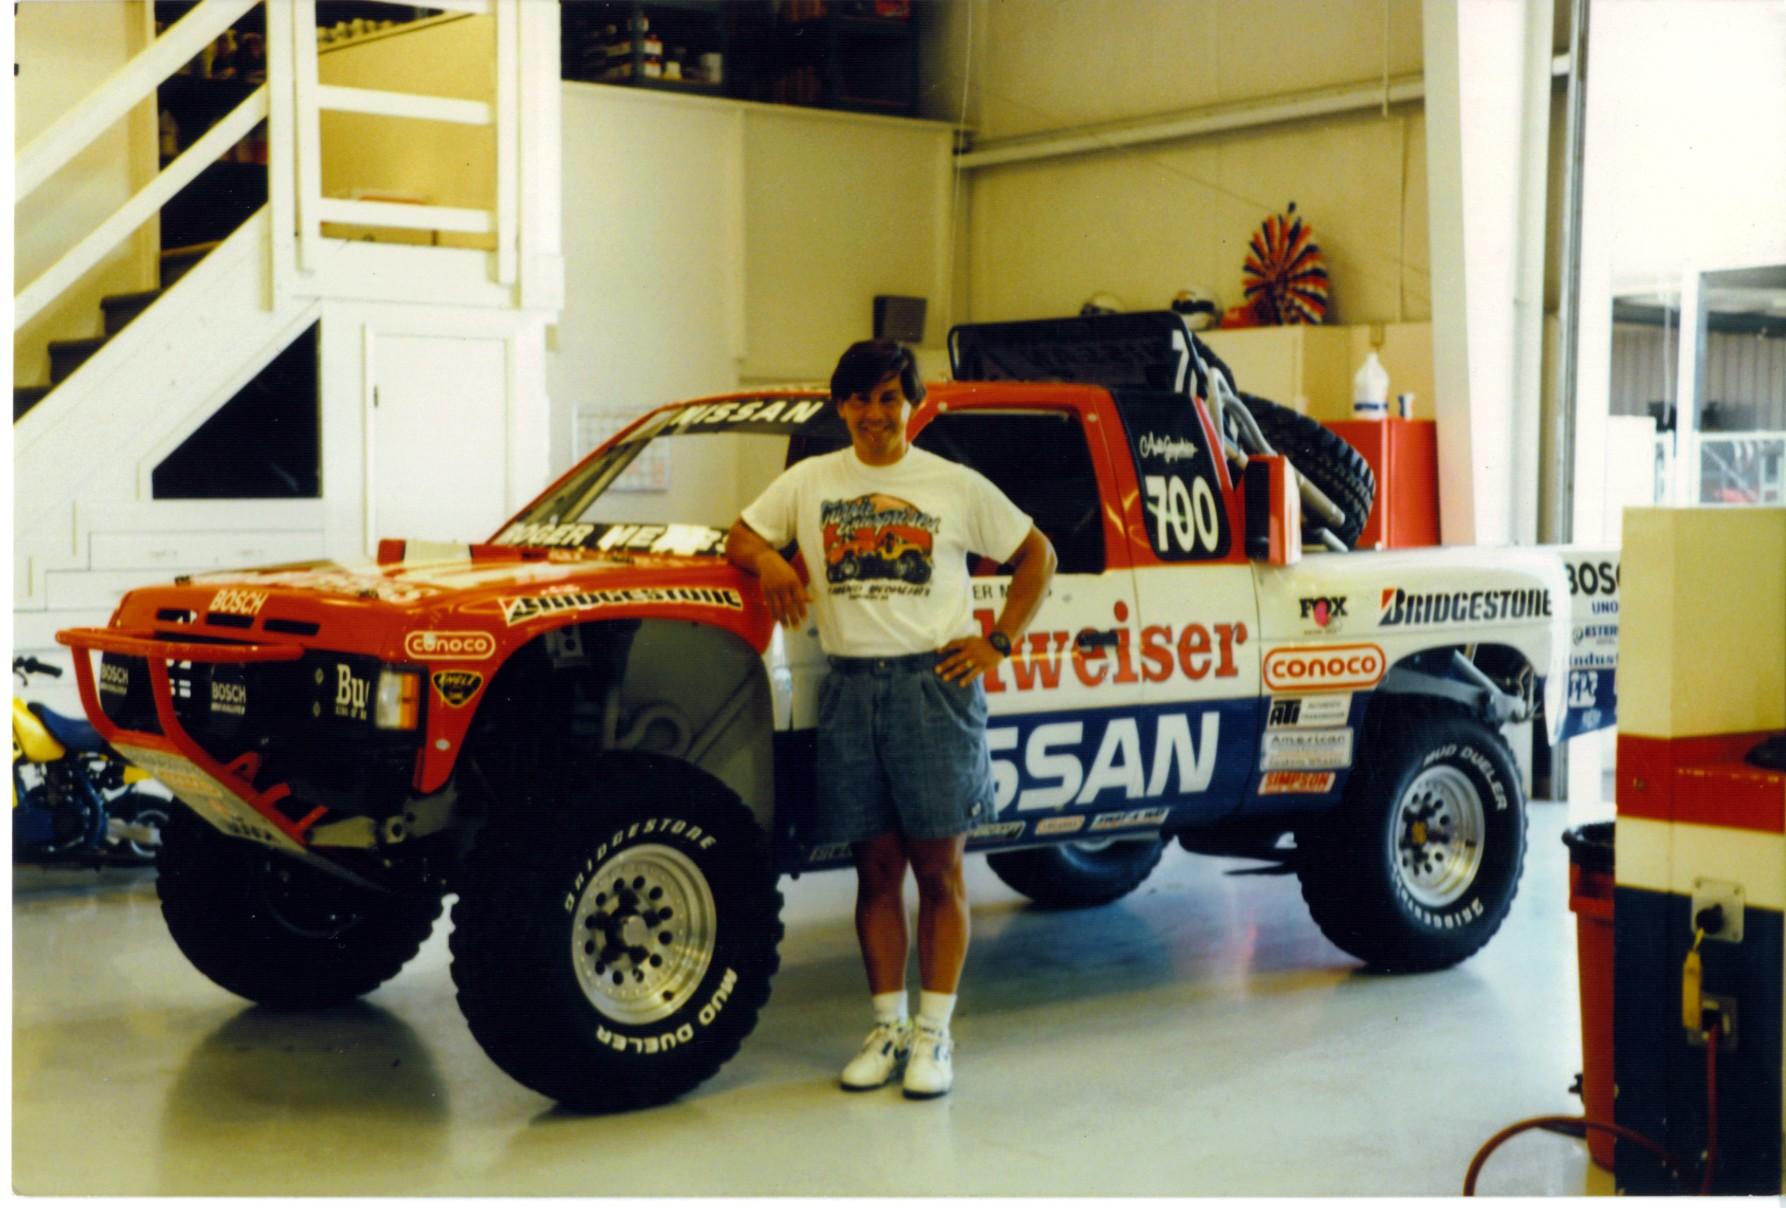 95 Nissan Hardbody Pickup Engine Compatibility Roger Mears Racing Edit